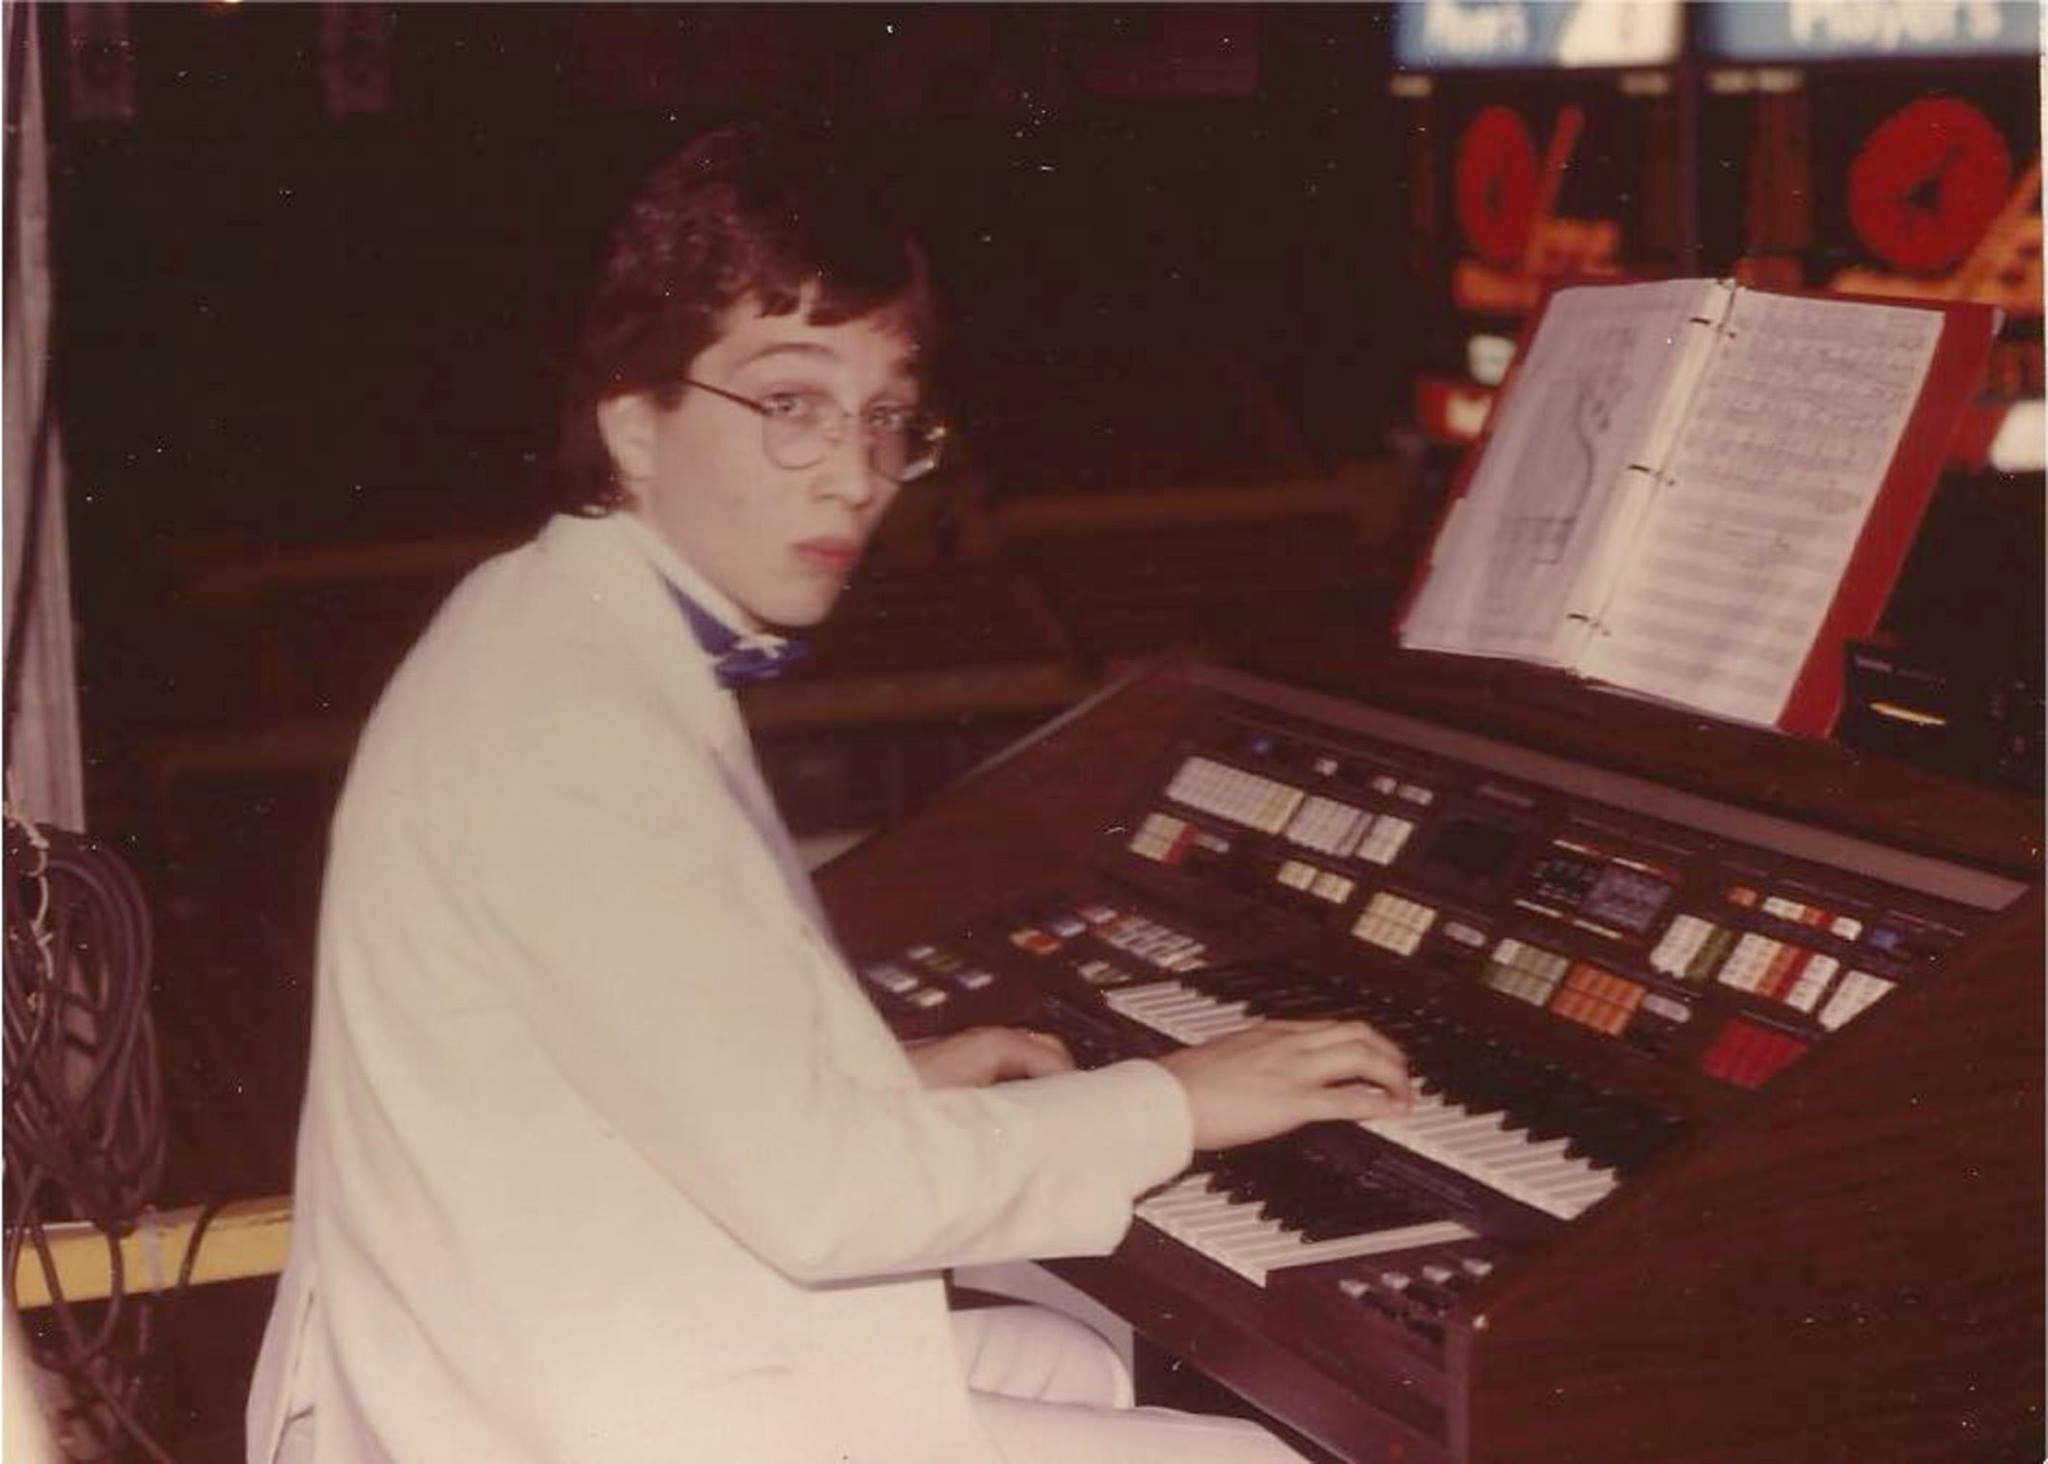 Earl MacDonald playing the organ at a Winnipeg Jets game, circa 1987